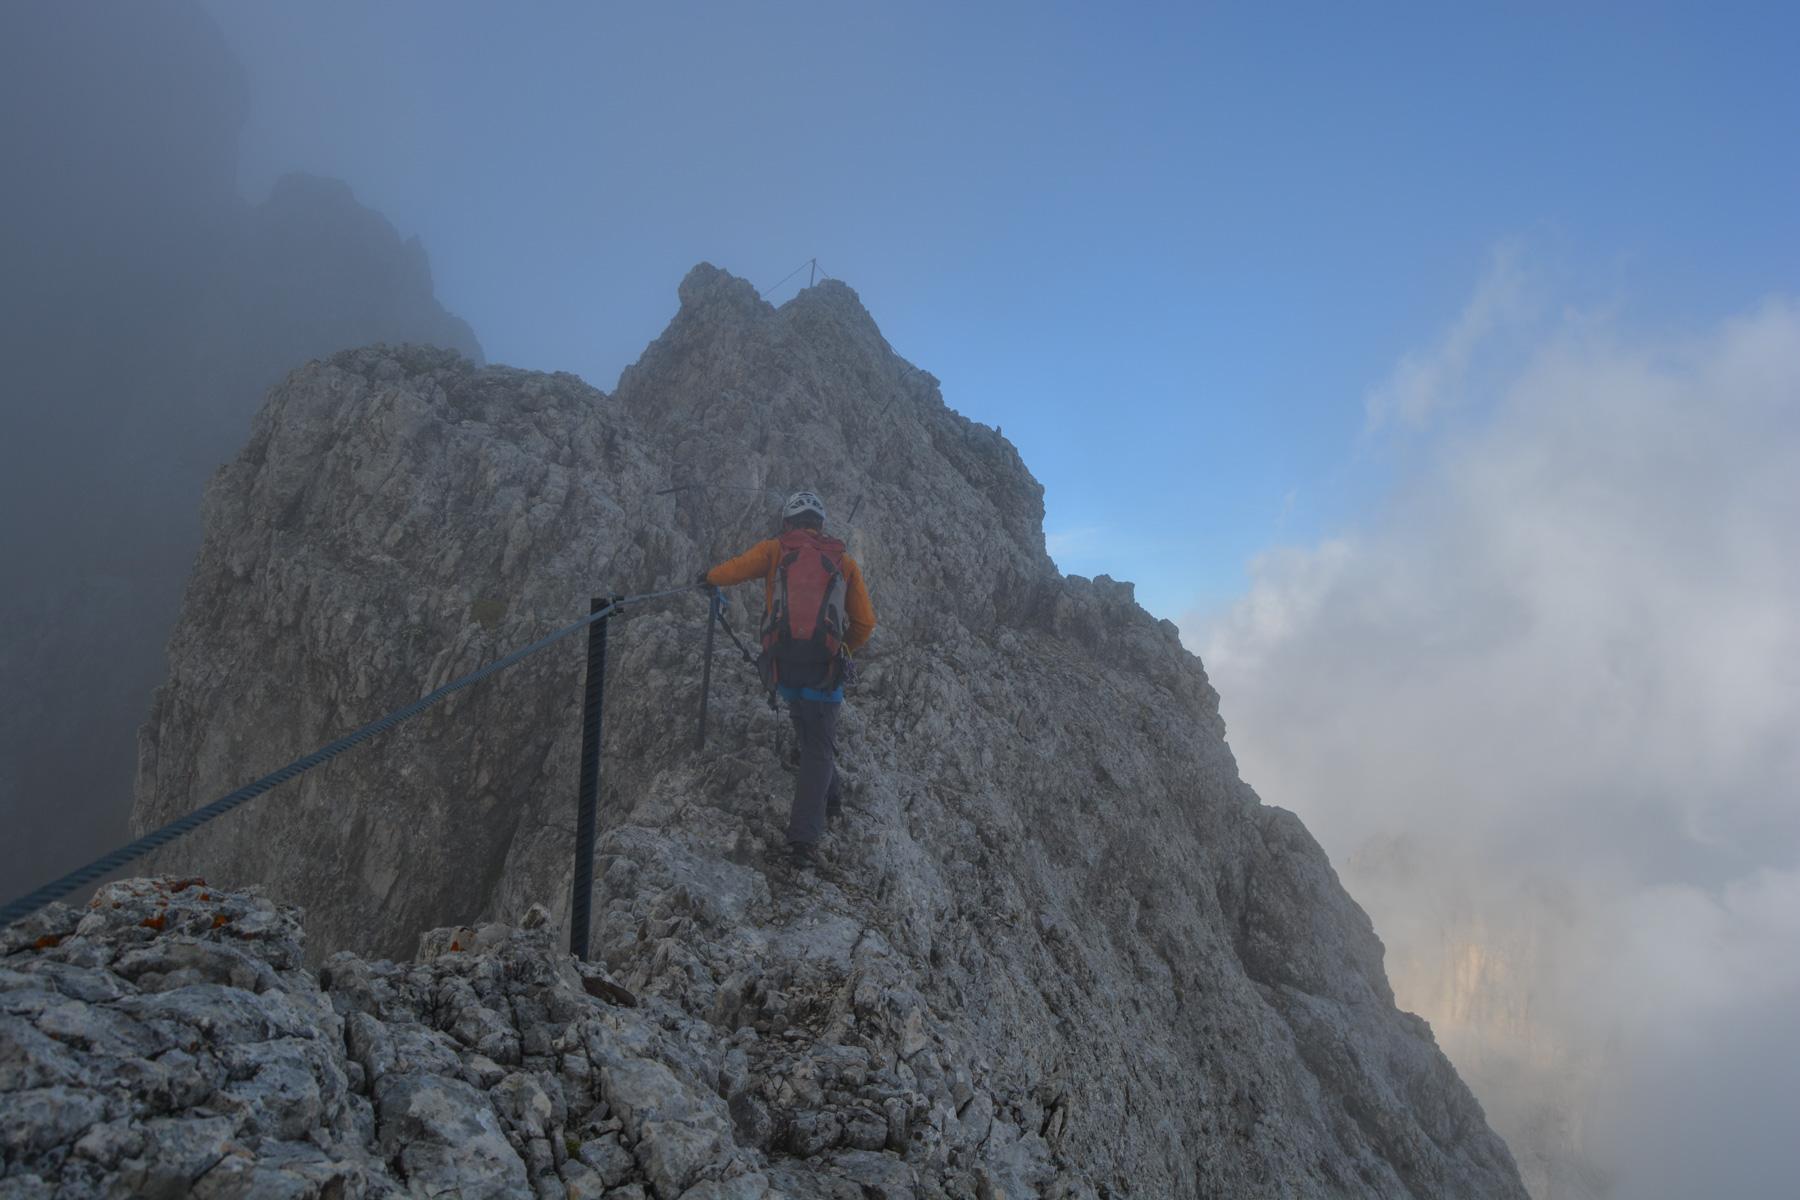 Via Eterna Brigata Cadore, Dolomites 18